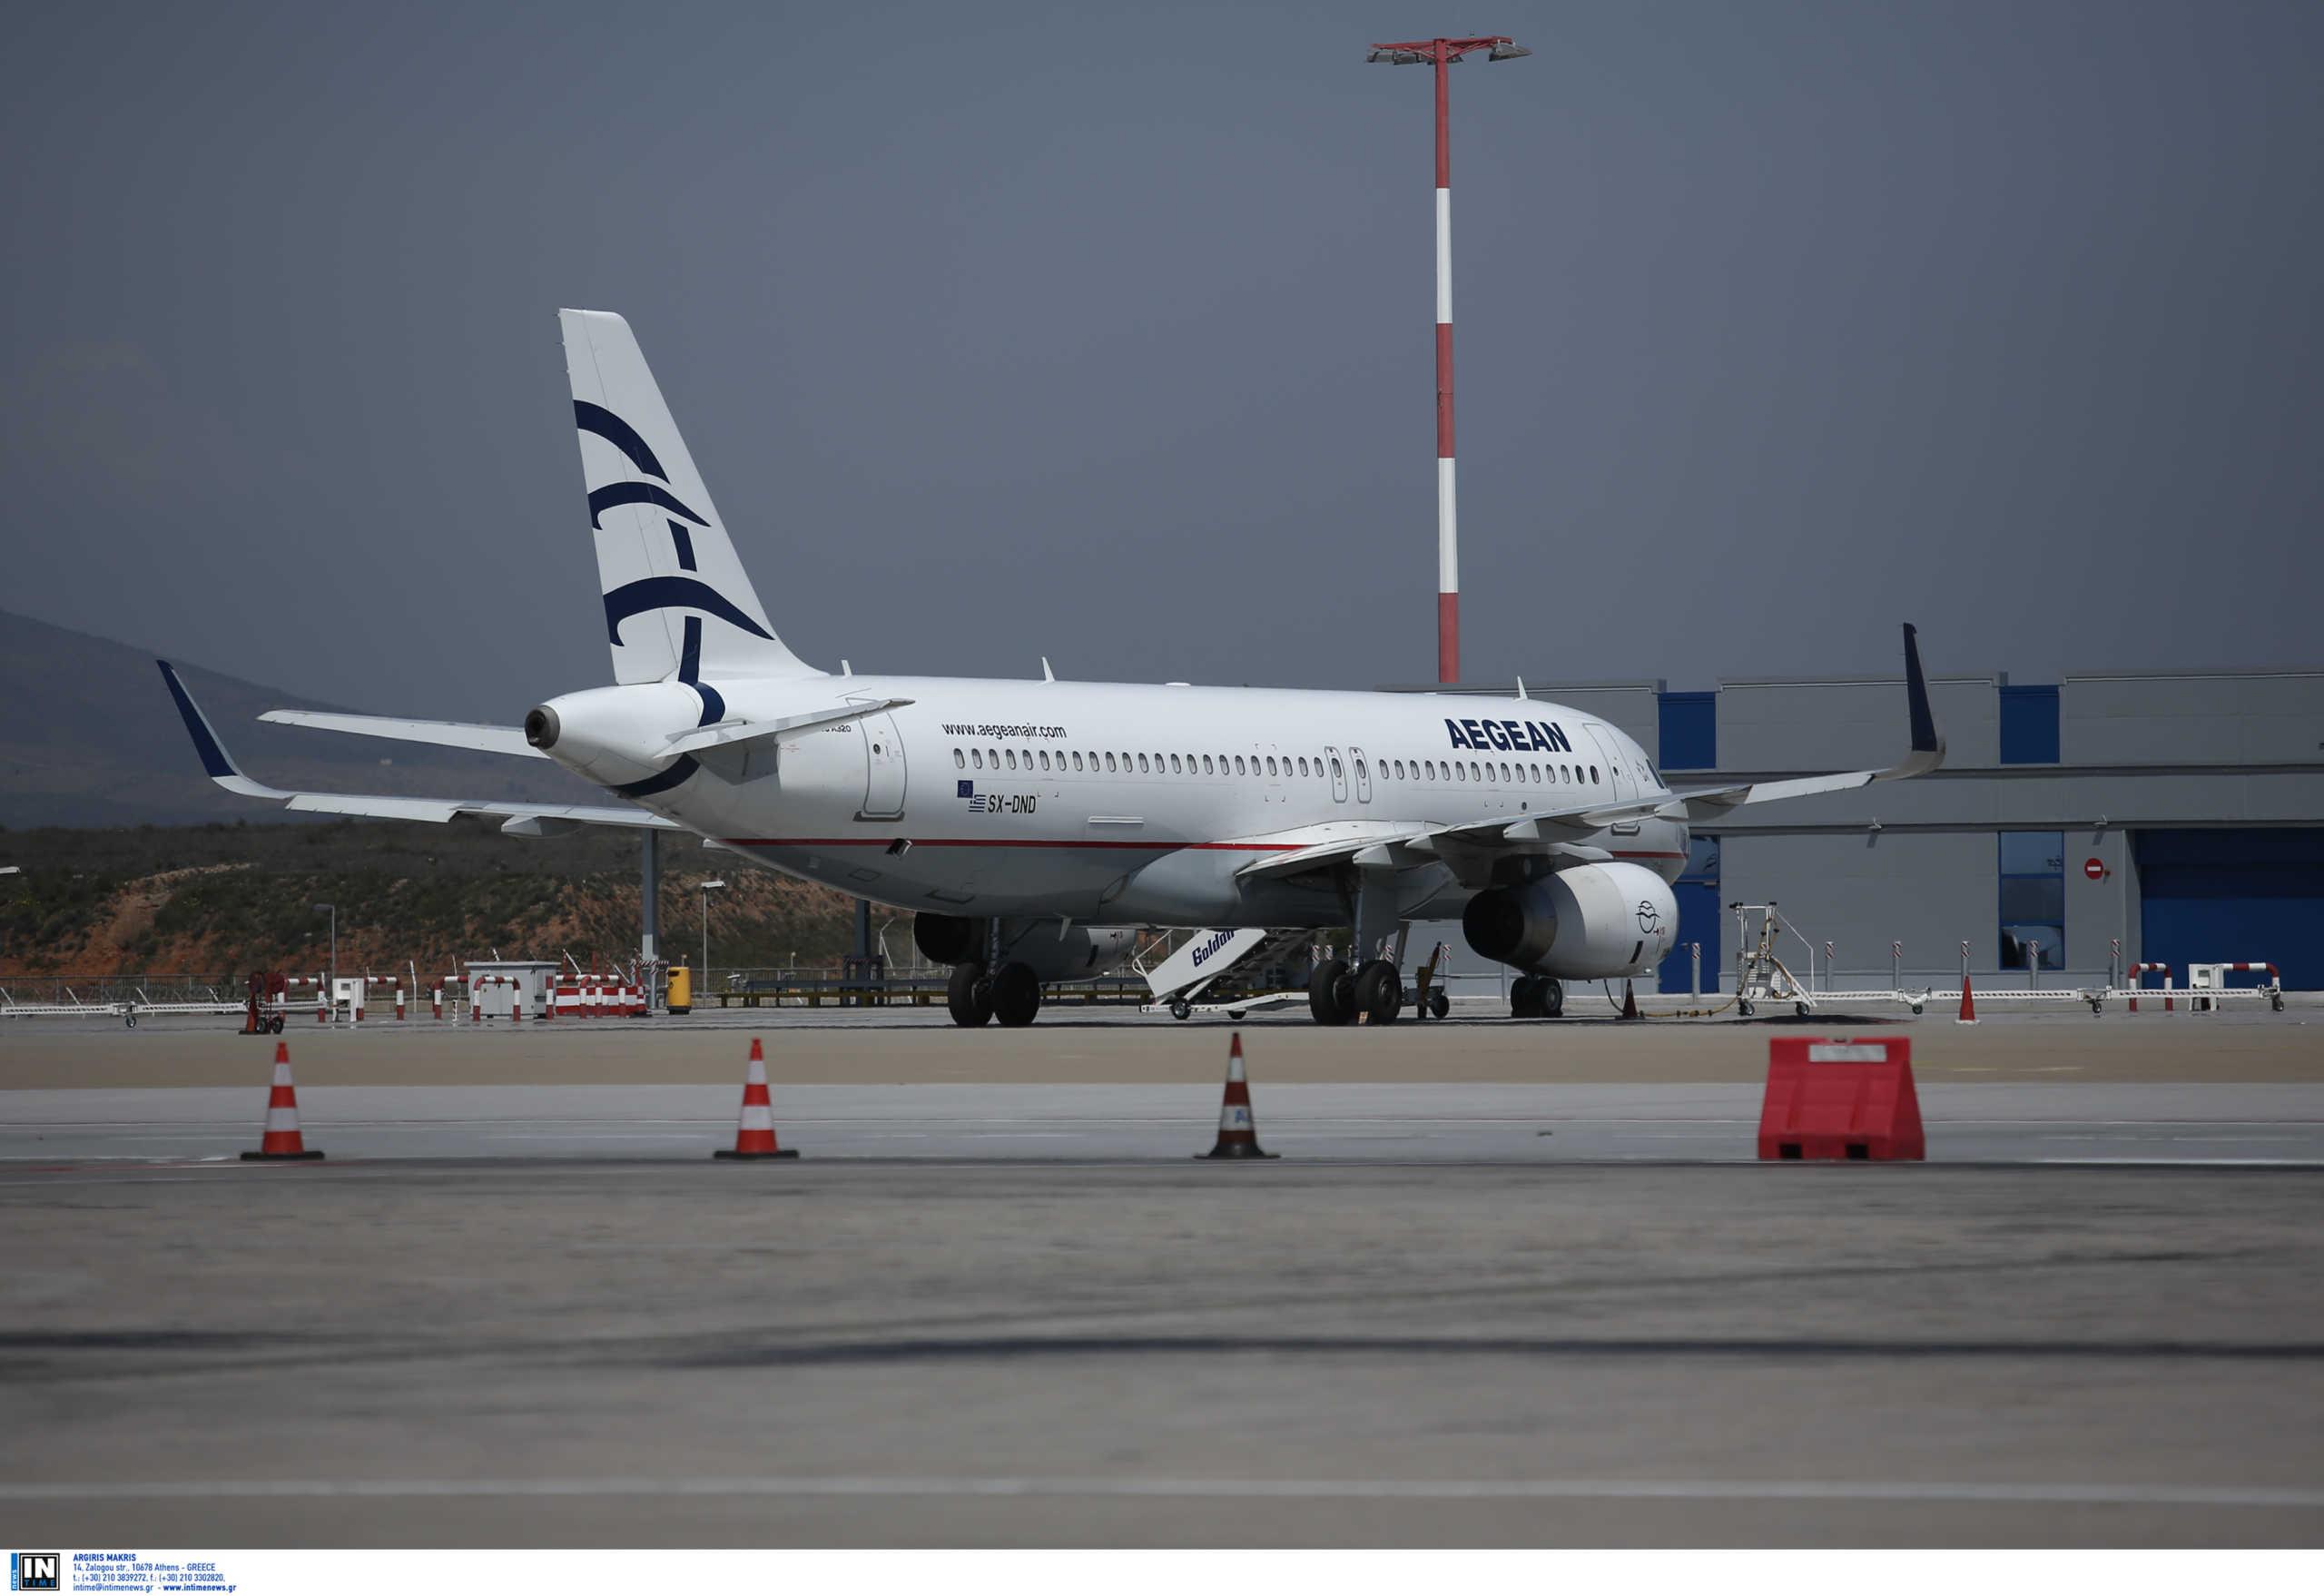 Aegean, Olympic Air, Sky Express: Ακυρώσεις και τροποποιήσεις πτήσεων λόγω απεργίας – Αναλυτικά η λίστα